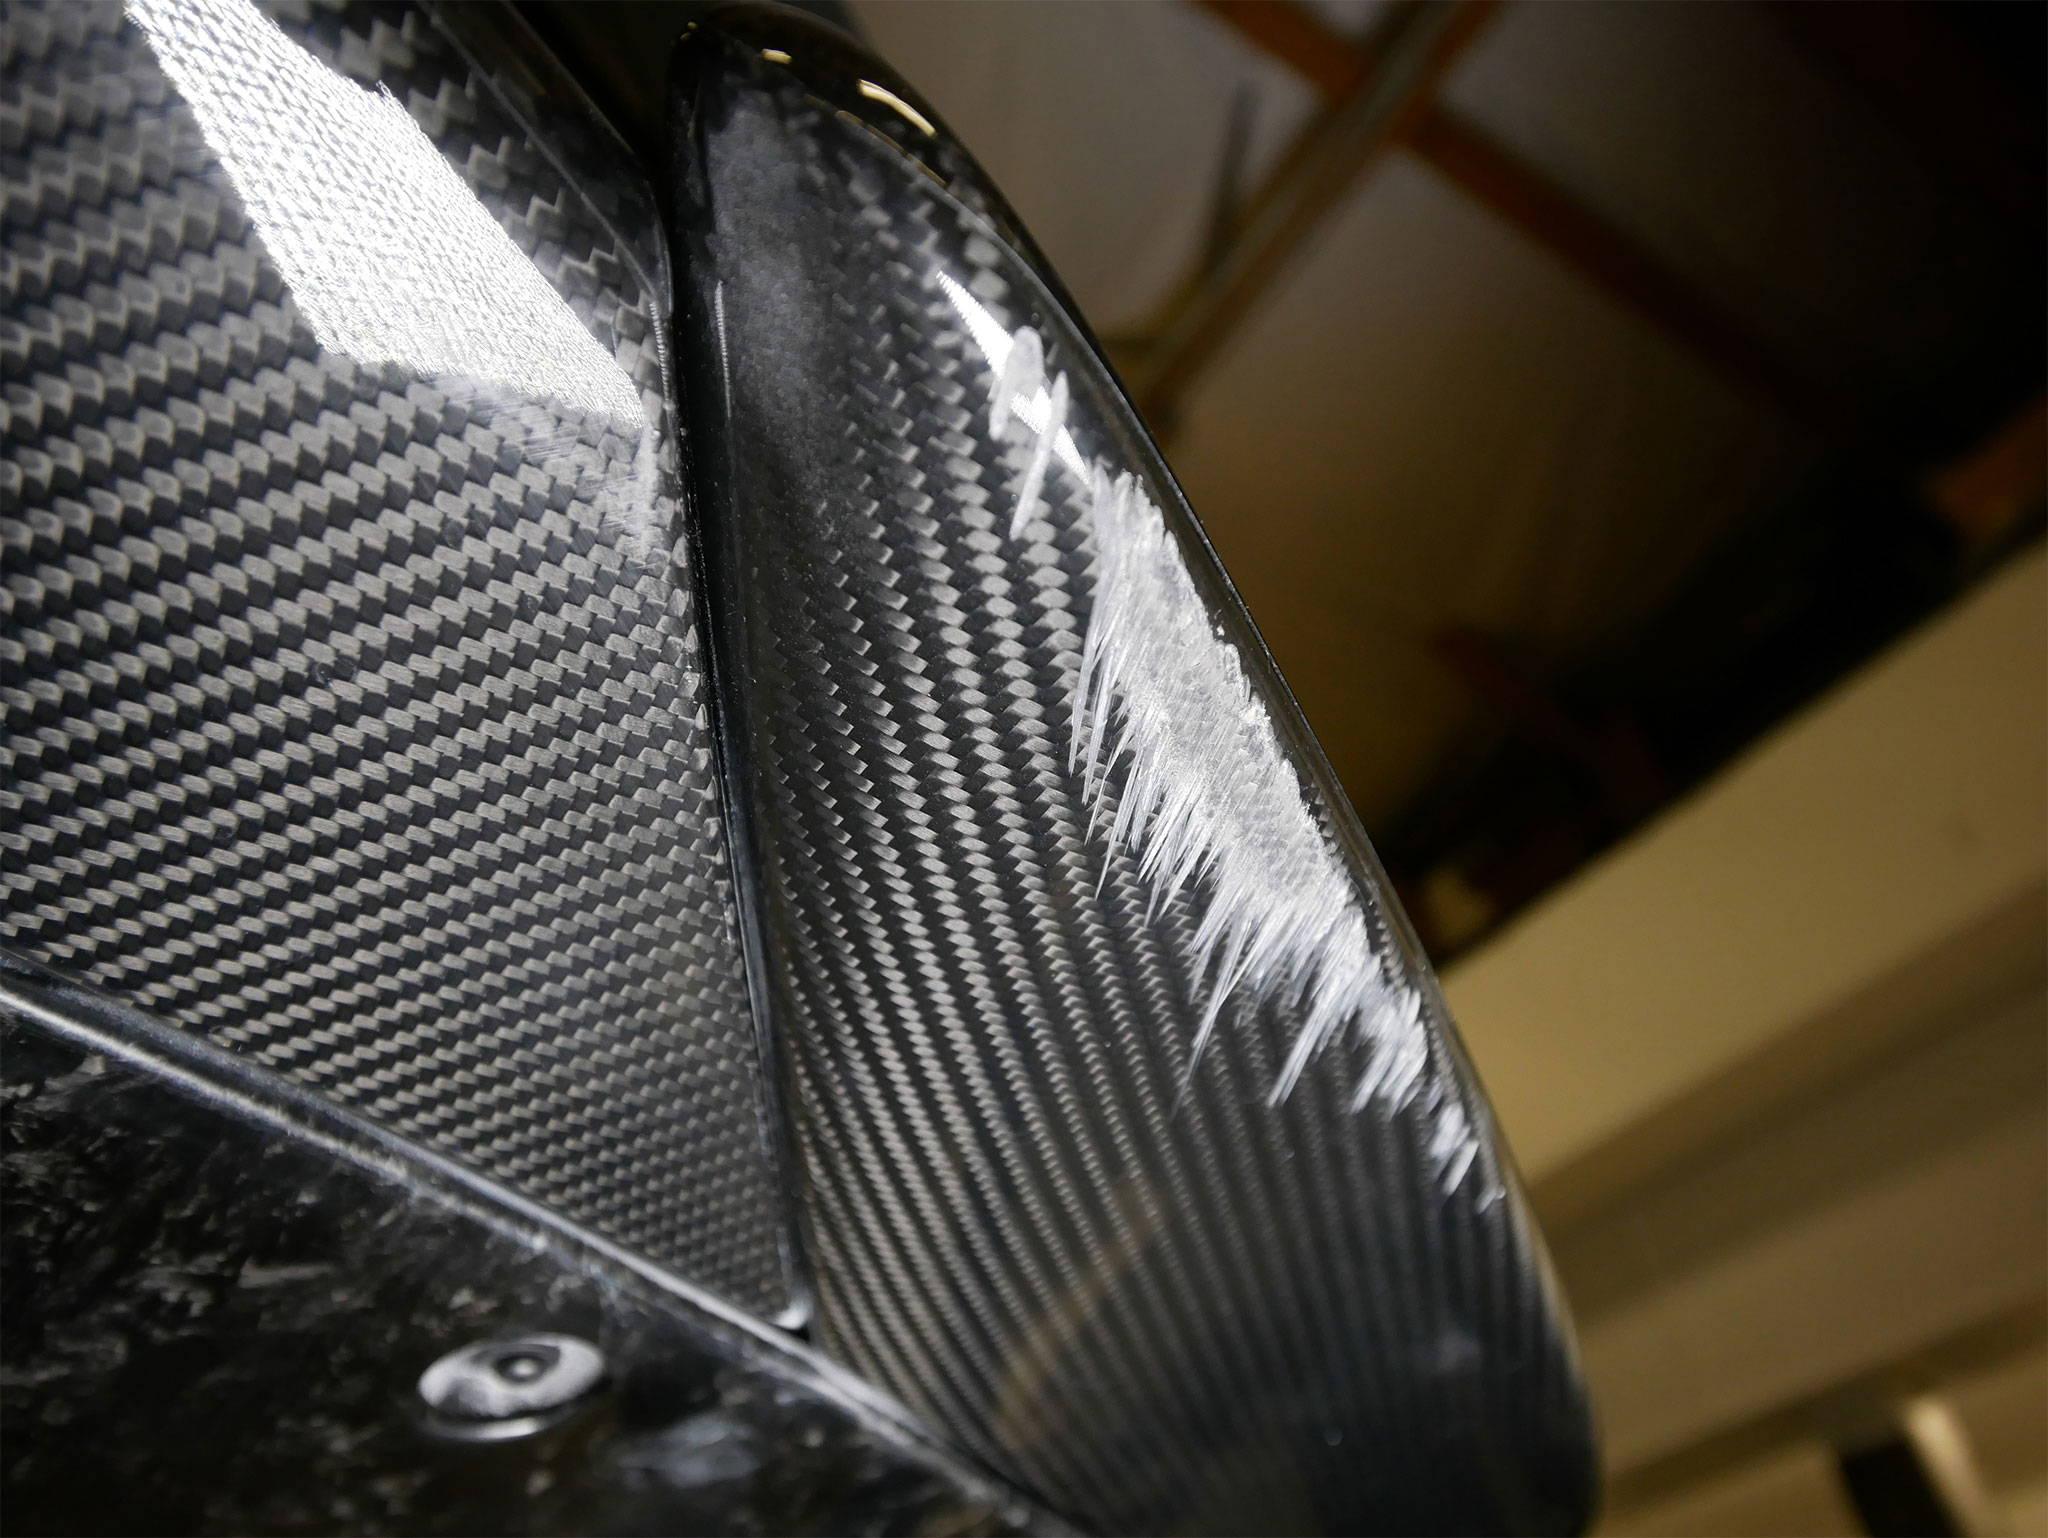 McLaren 600LT Bumper Damage